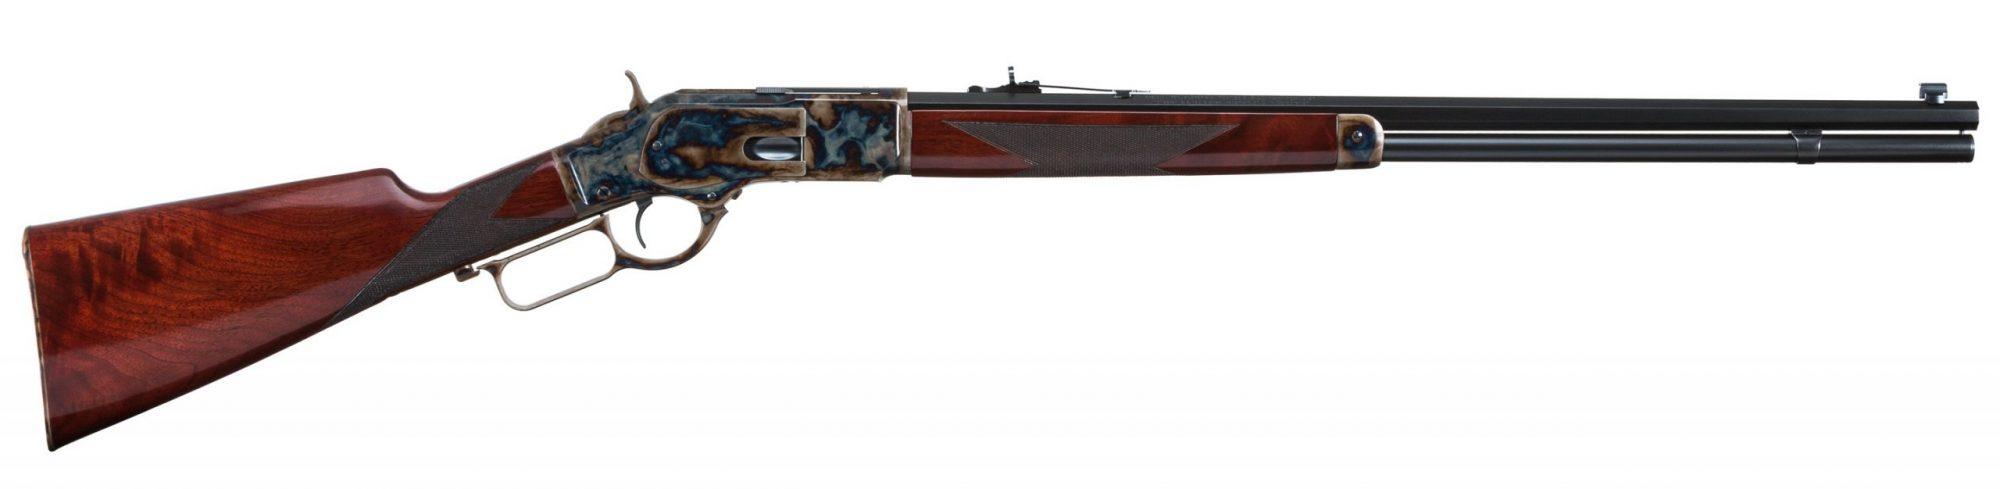 6278 Turnbull Winchester 1873 45 Colt 00058ZT73W